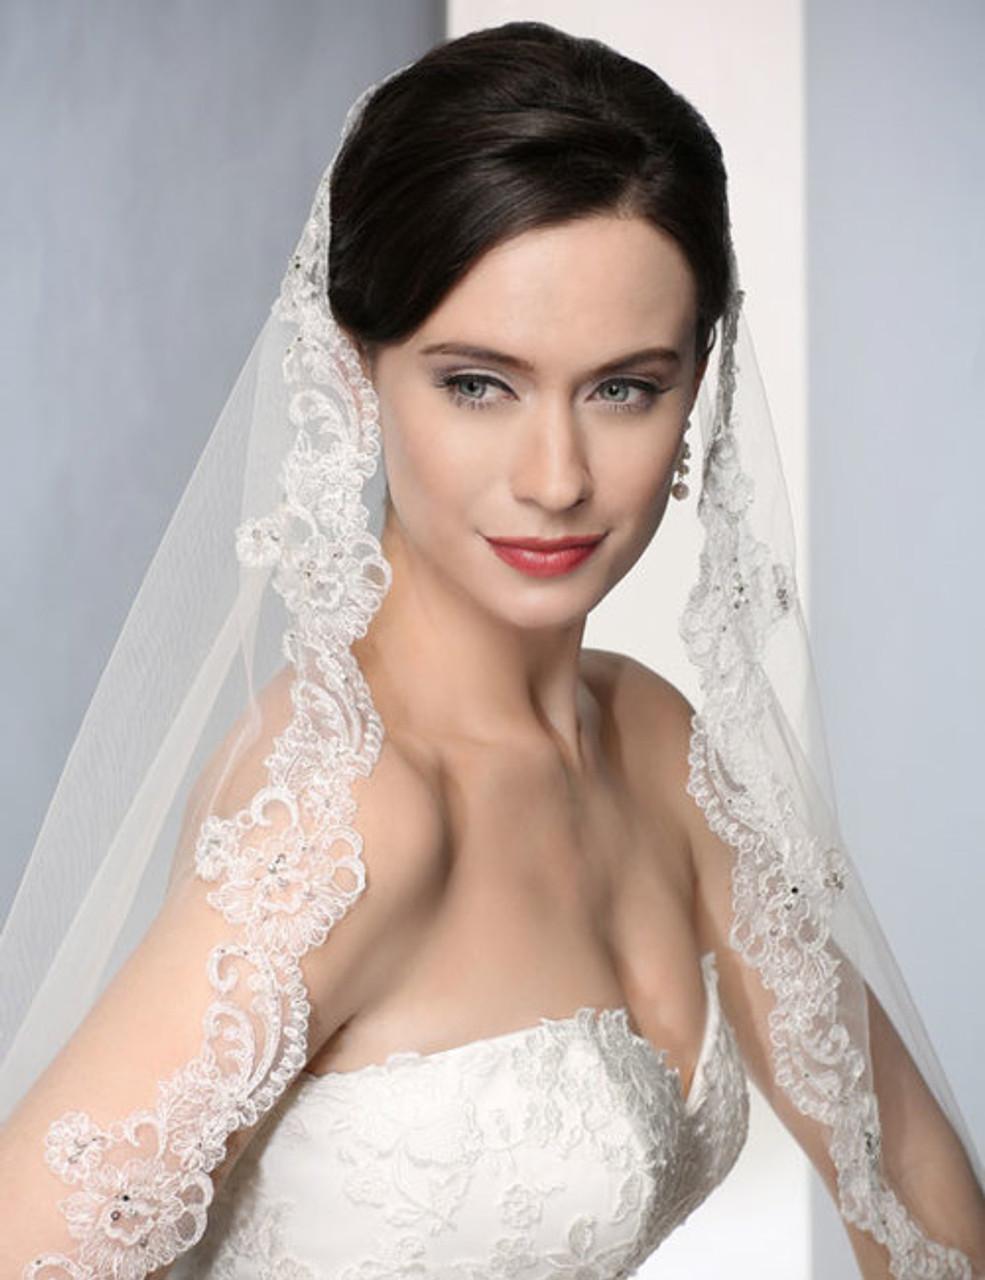 Bel Aire Bridal Wedding Veil V7183C - Cathedral Wedding Veil  Length - Mantilla Style - Alencon Lace